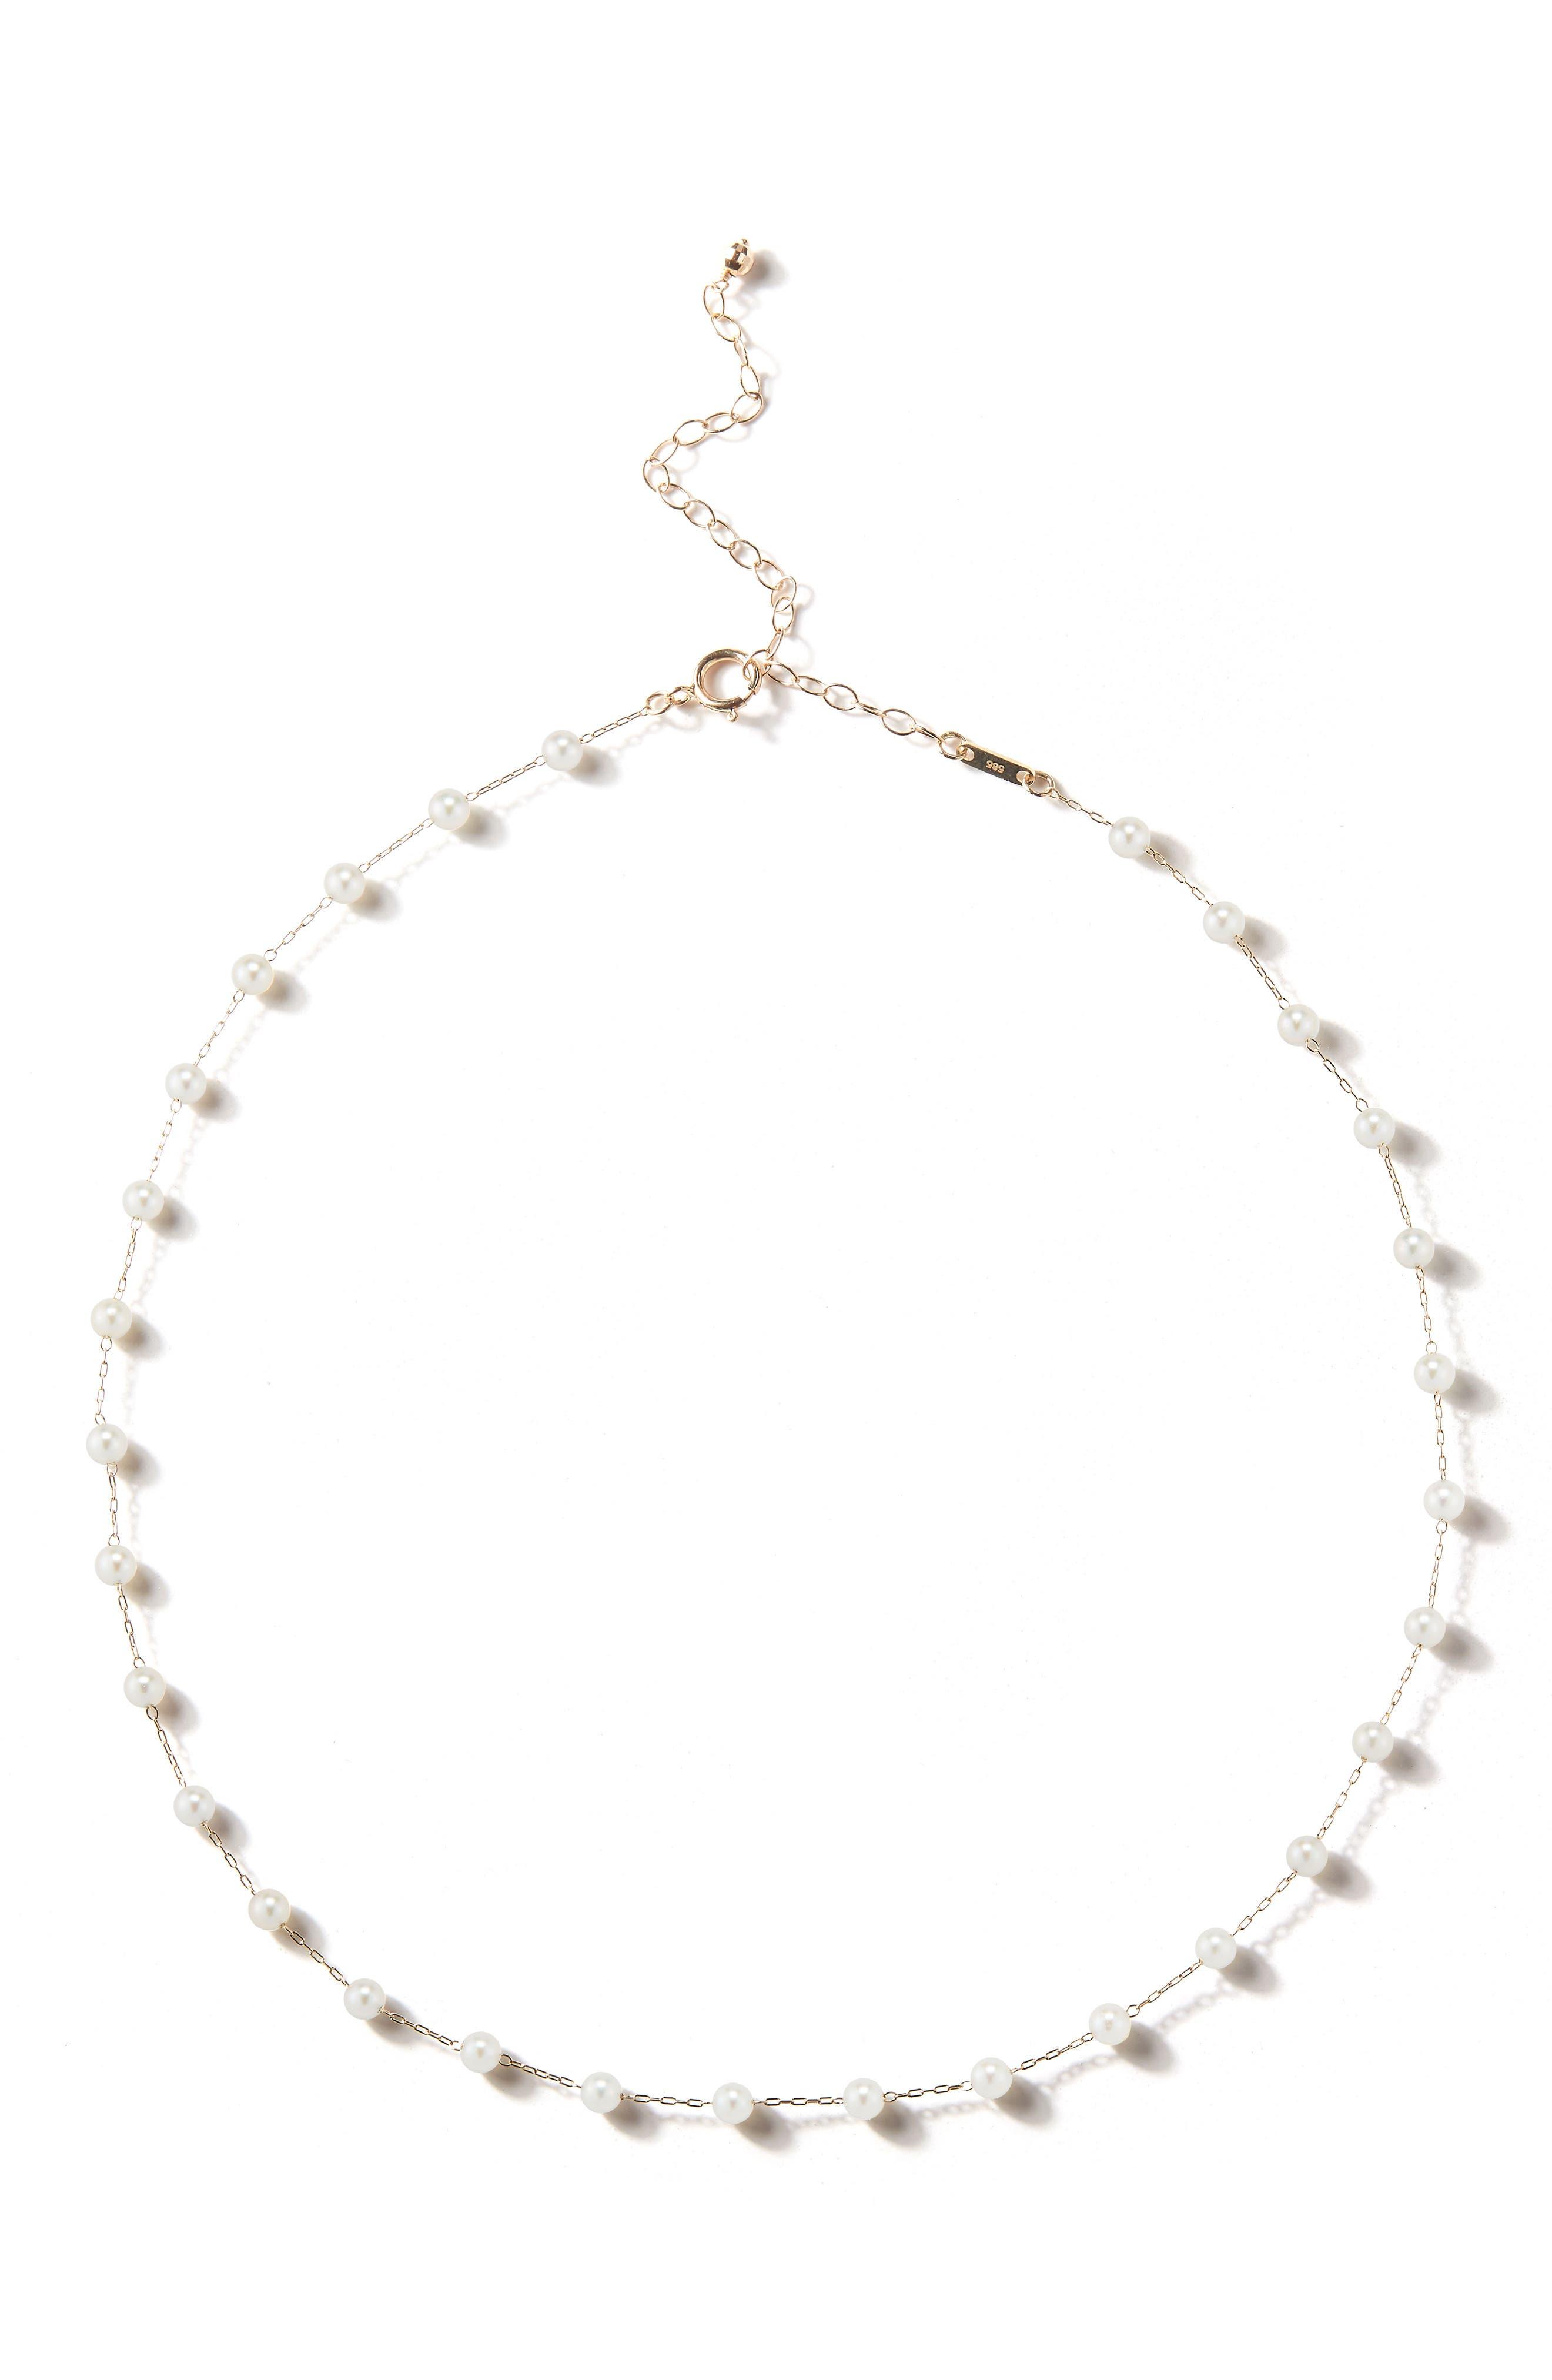 Pearl Choker Necklace,                             Main thumbnail 1, color,                             710